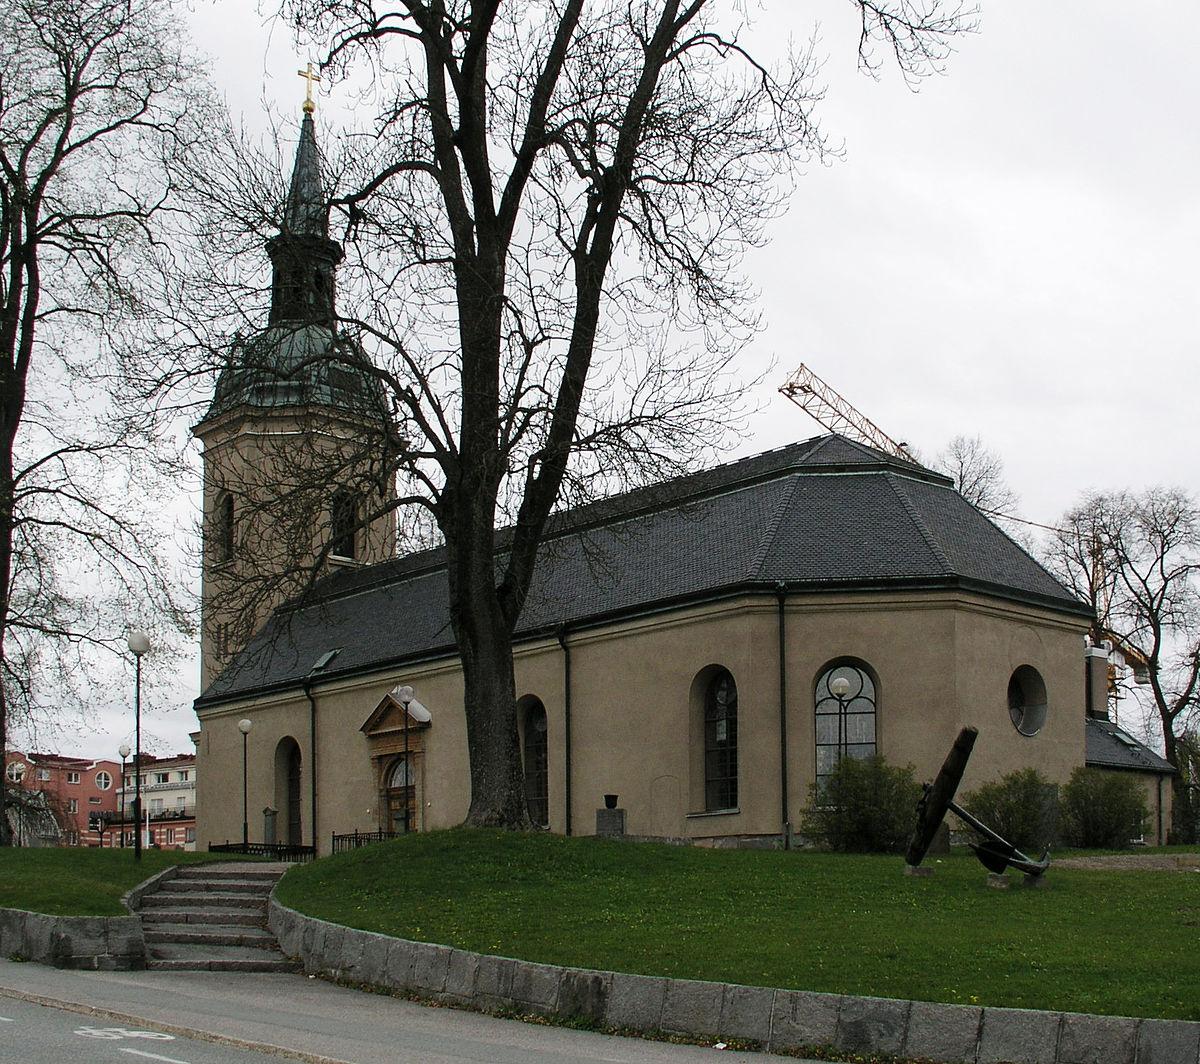 Fil:Norrtalje kyrka hayeshitzemanfoundation.org Wikipedia